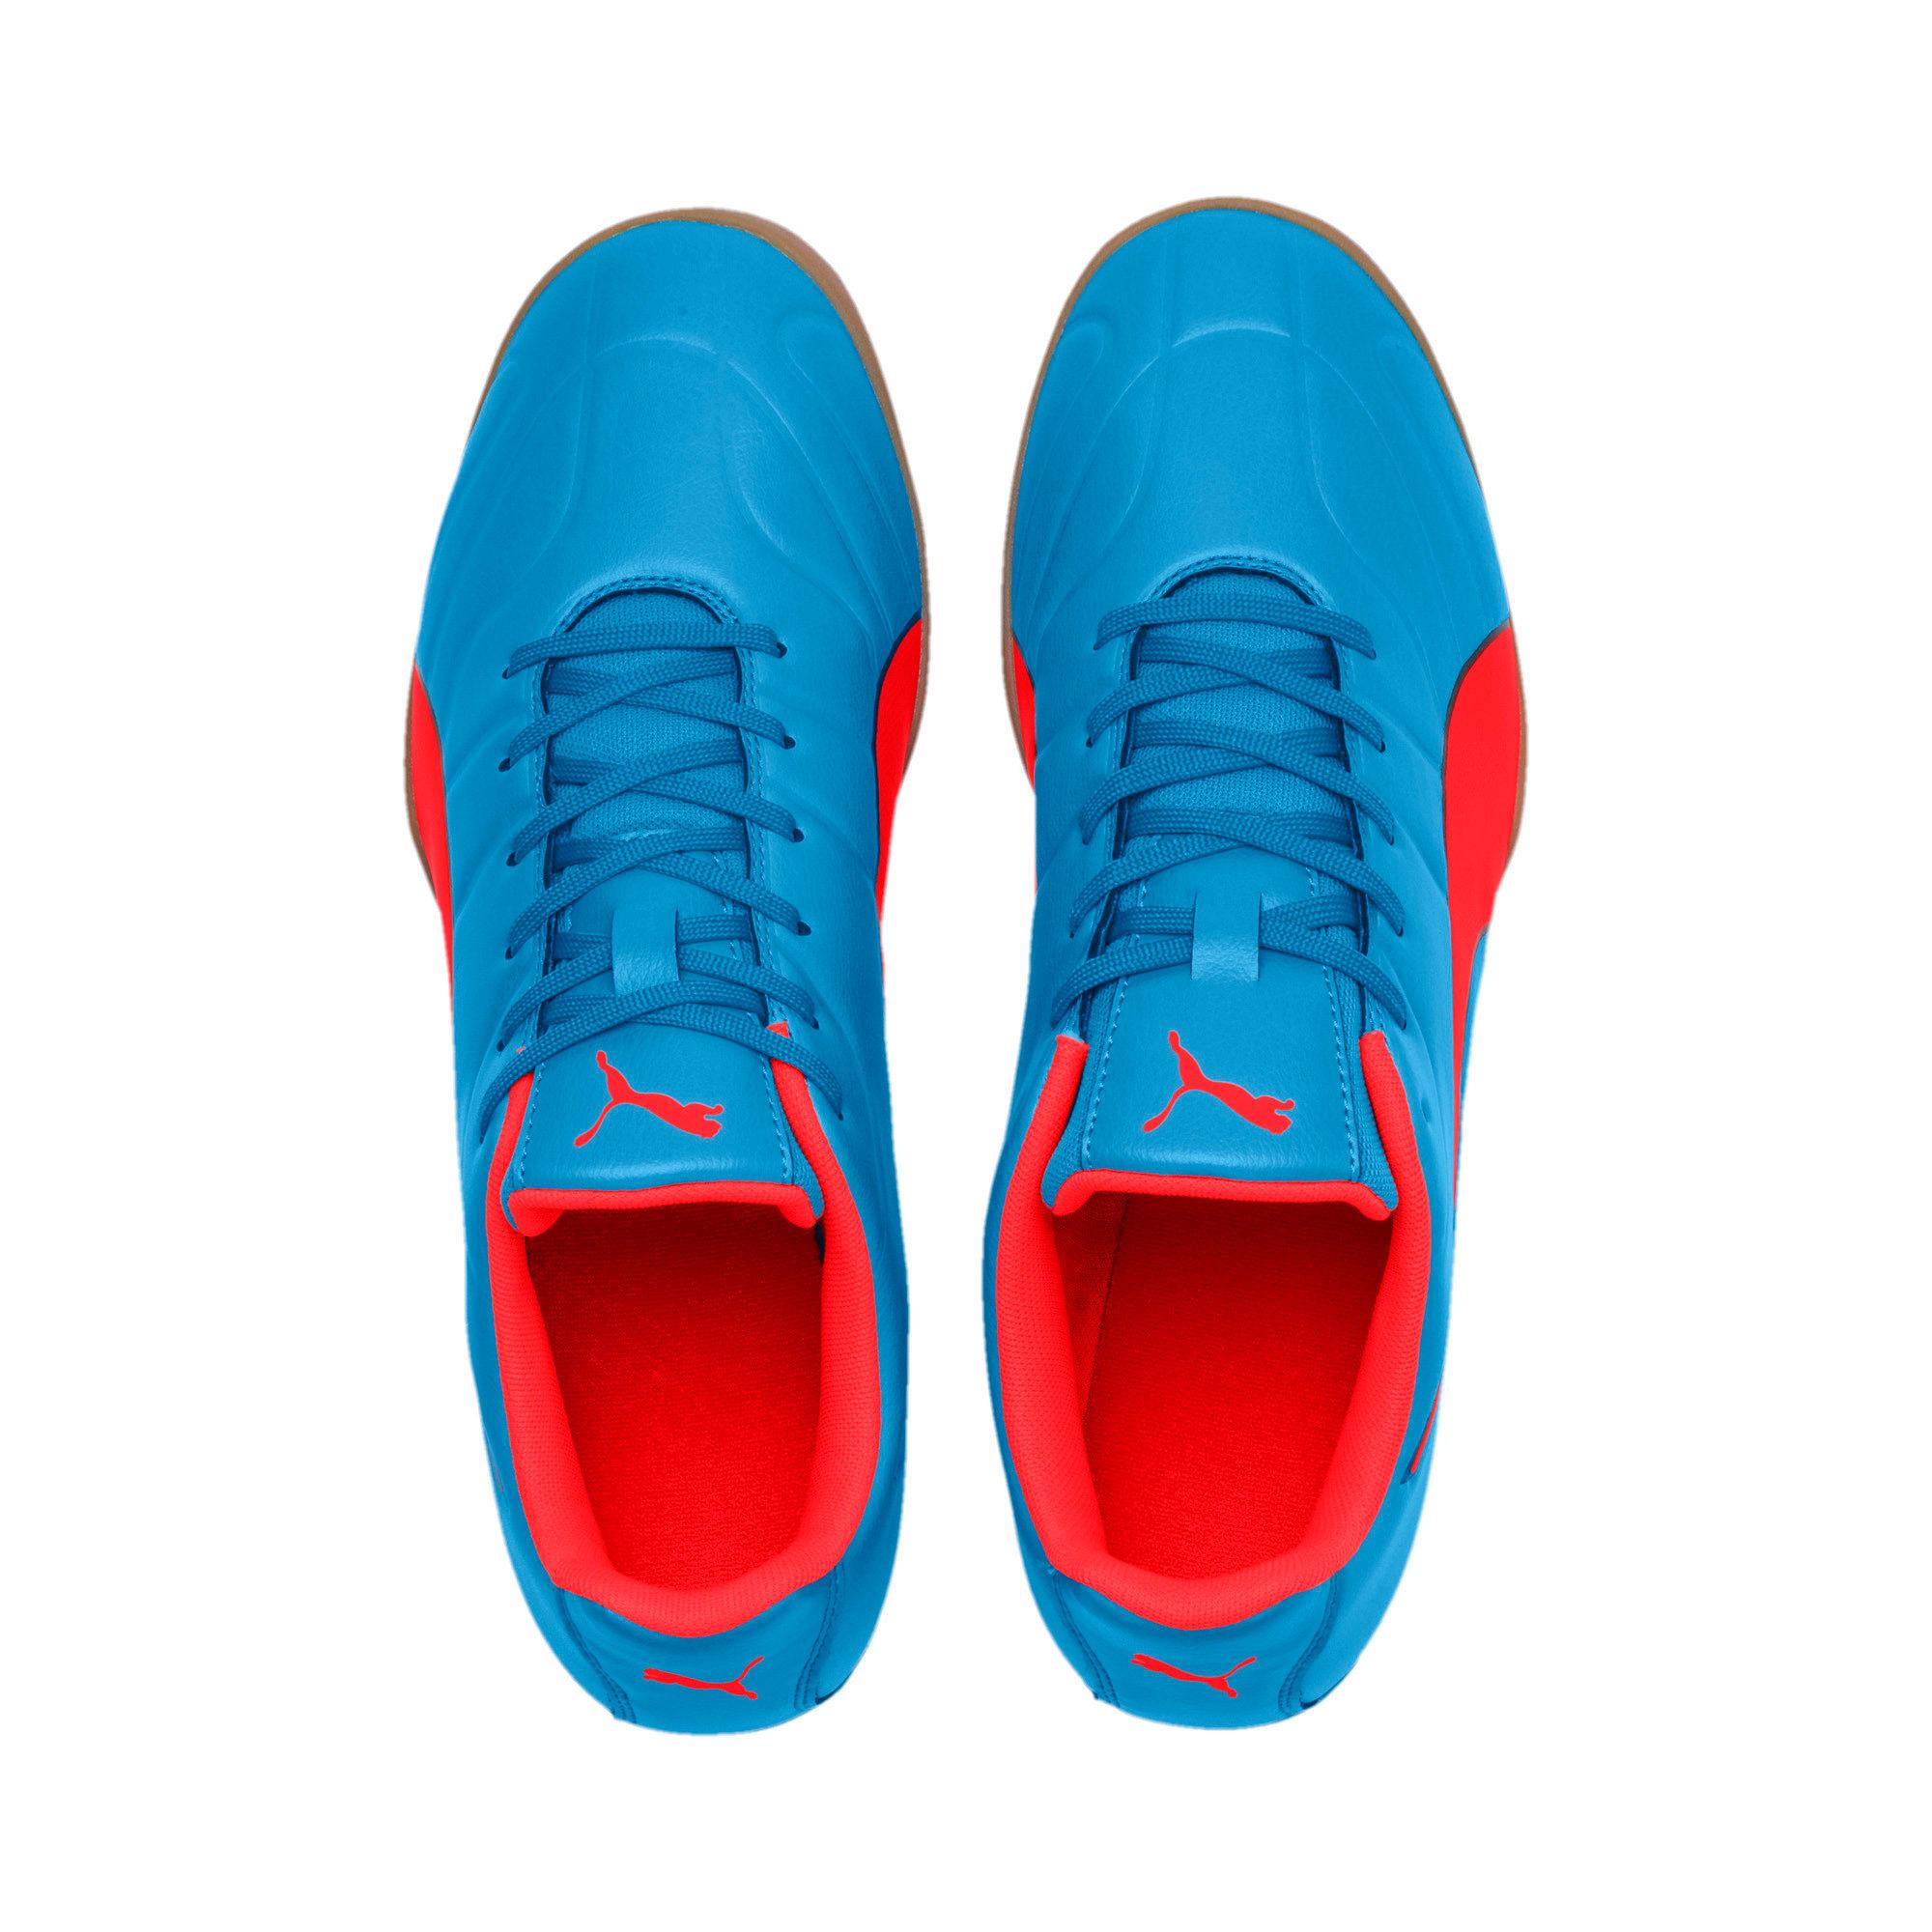 Thumbnail 4 of Classico C II Sala Men's Football Boots, Bleu Azur-Red Blast-Black, medium-IND